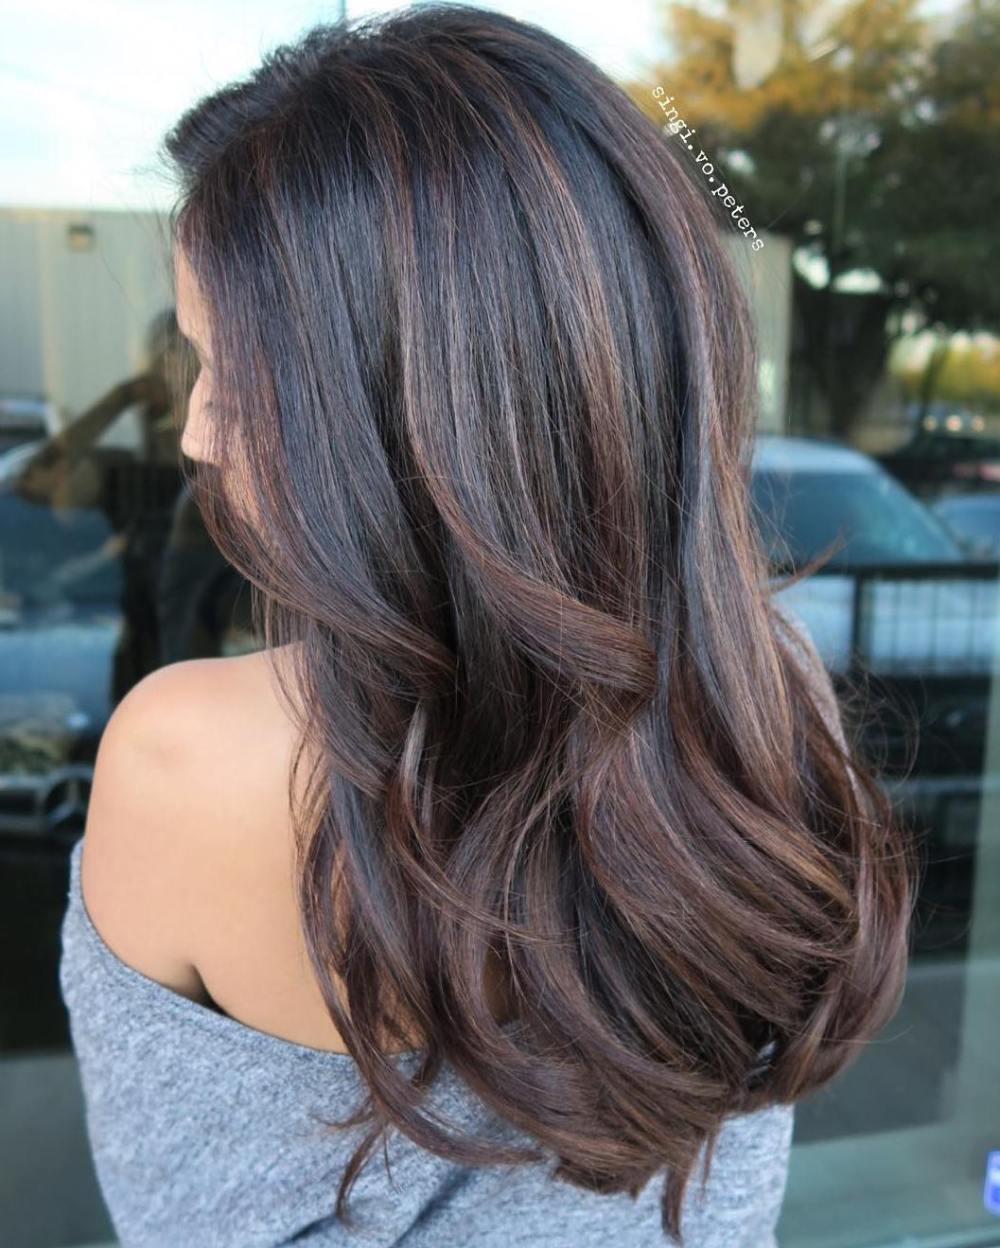 Trubridal Wedding Blog 90 Balayage Hair Color Ideas With Blonde